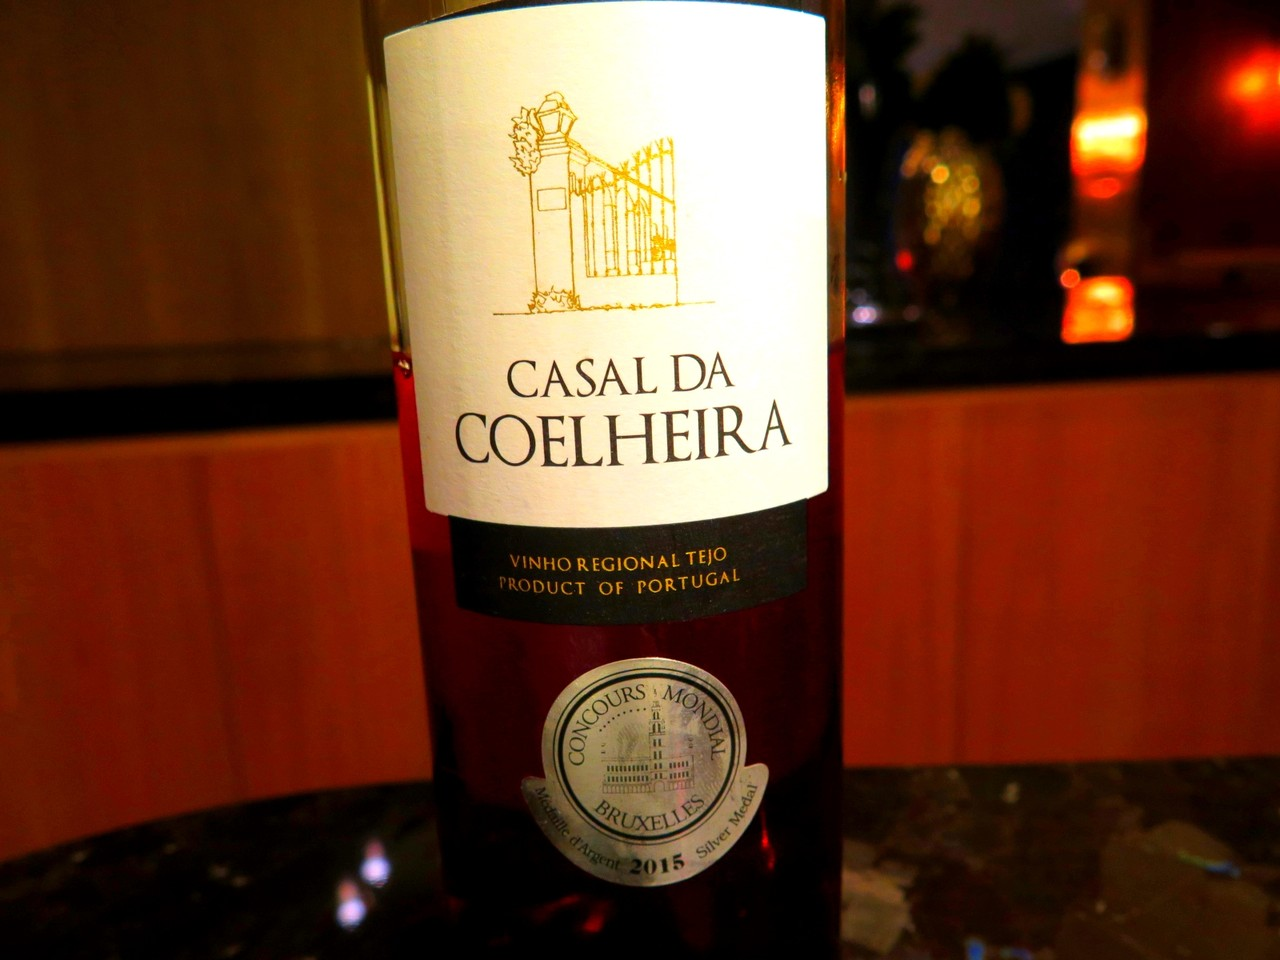 Casal da Coelheira rosé 2014